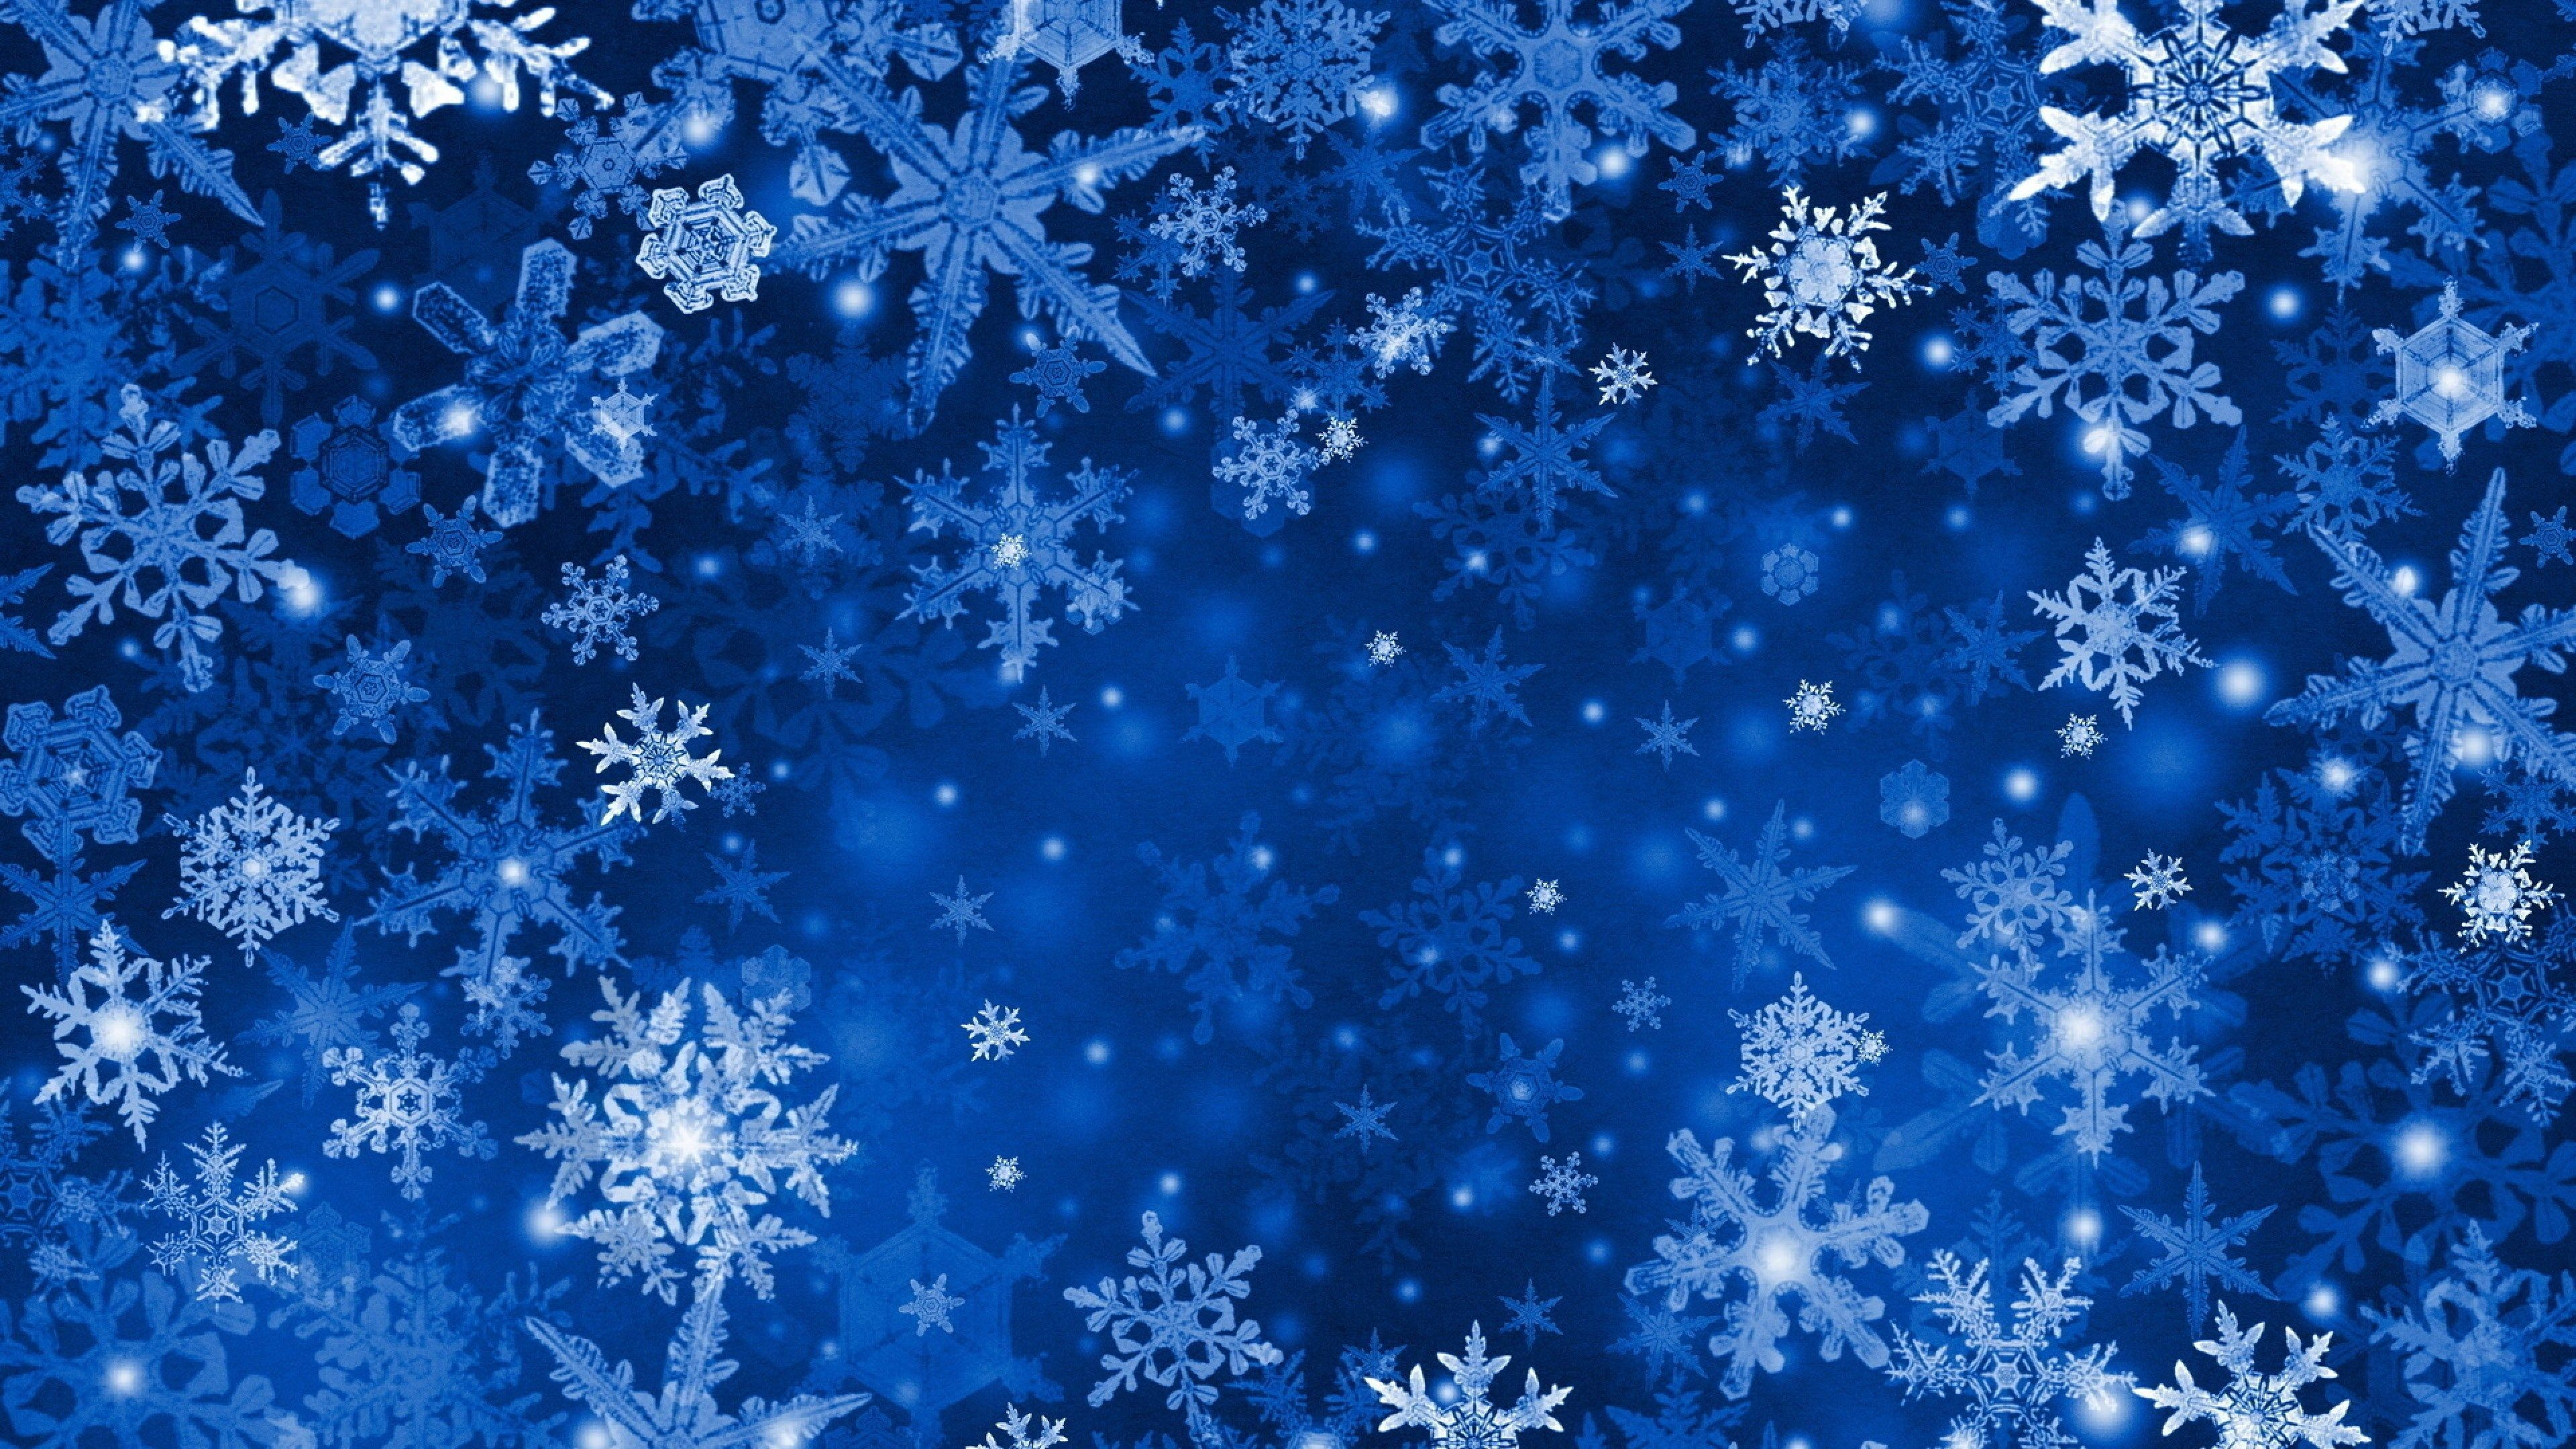 winter background wallpaper hd Snowflake wallpaper